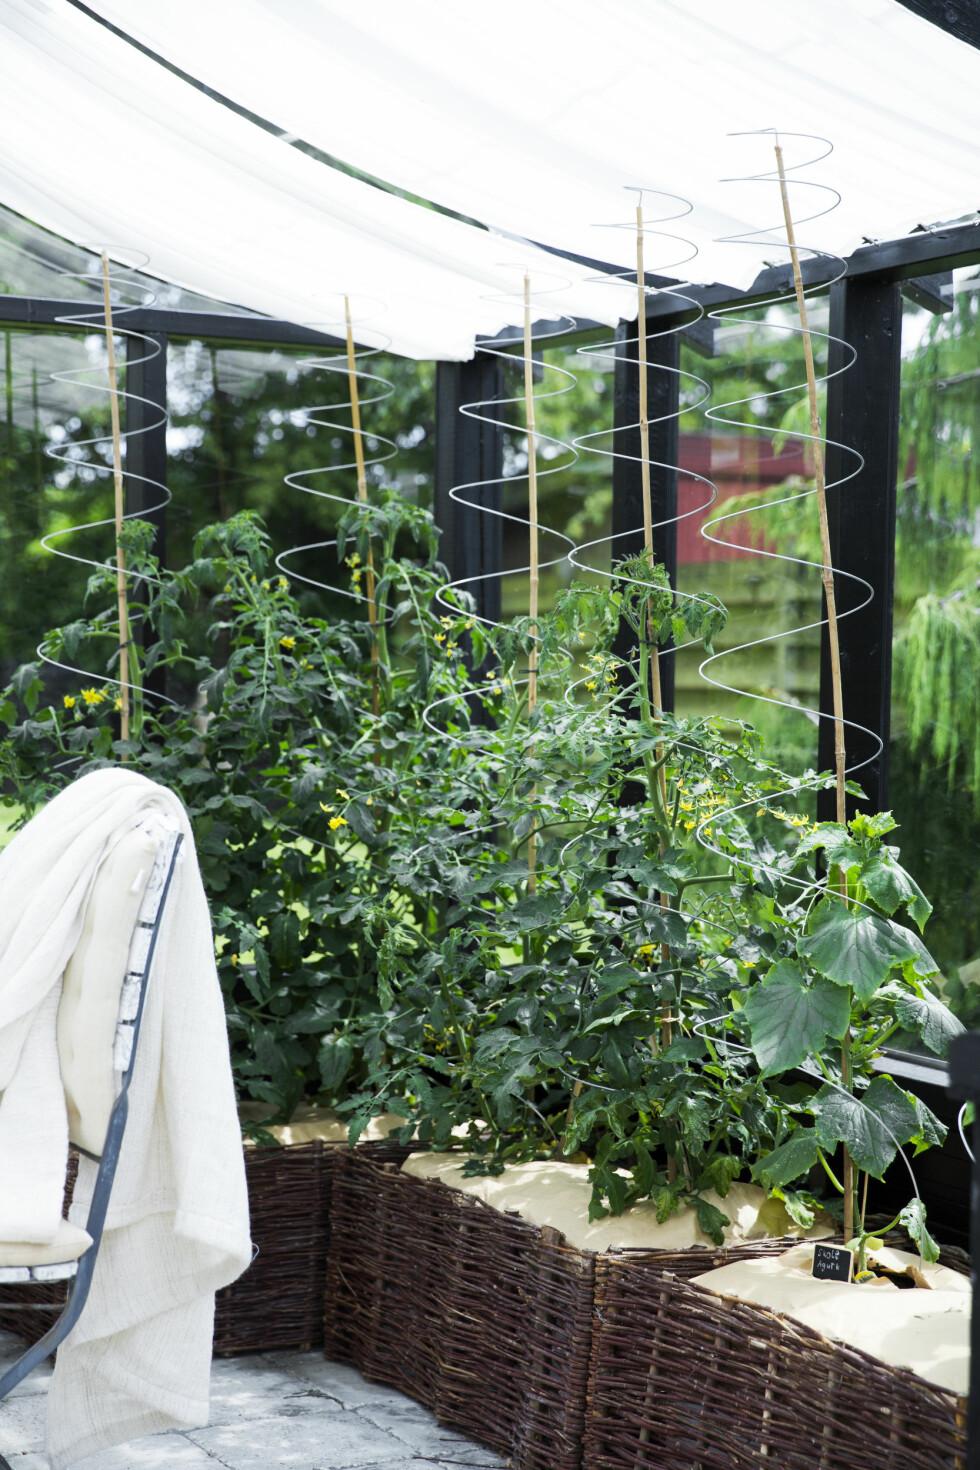 PRAKTISK DRIVHUS: Charlotte har dyrket både tomat og agurk idrivhuset. Foto: Tia Borgsmidt